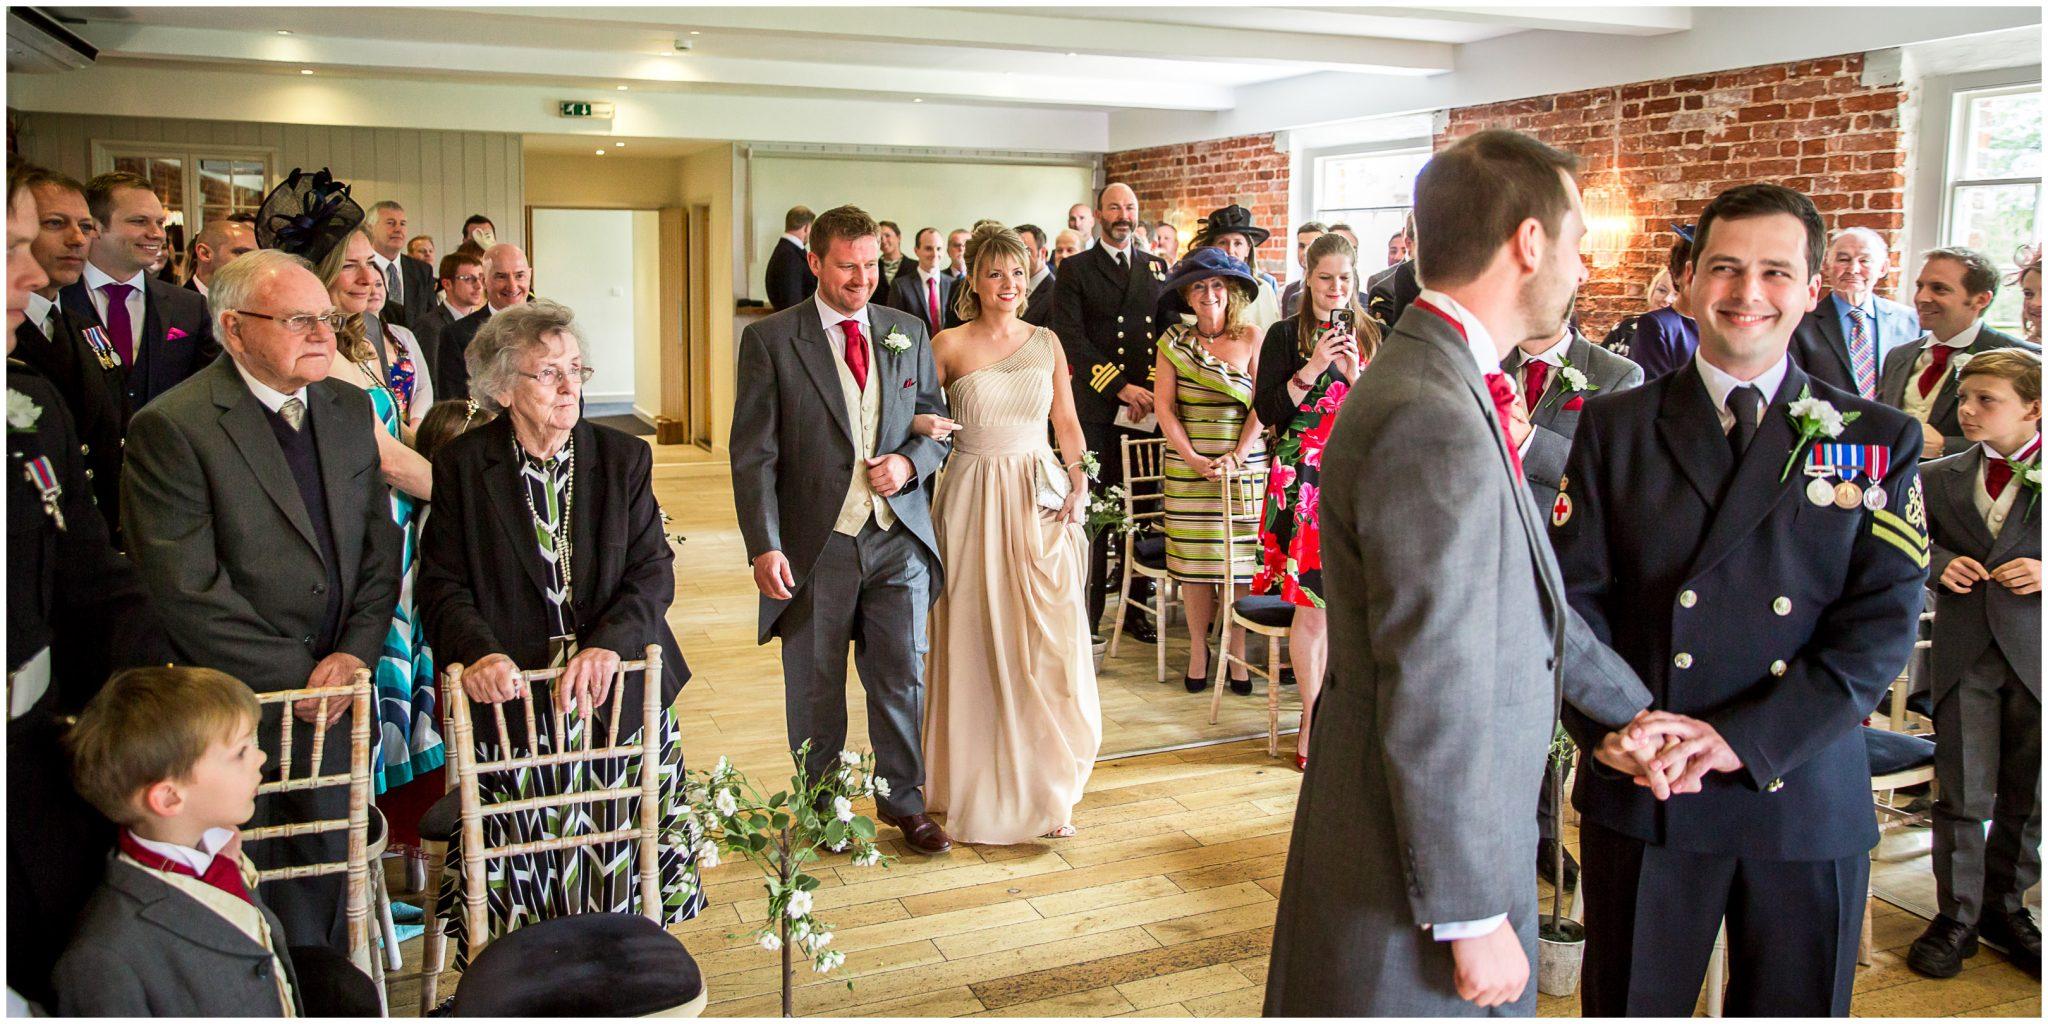 Sopley wedding photographer start of wedding ceremony